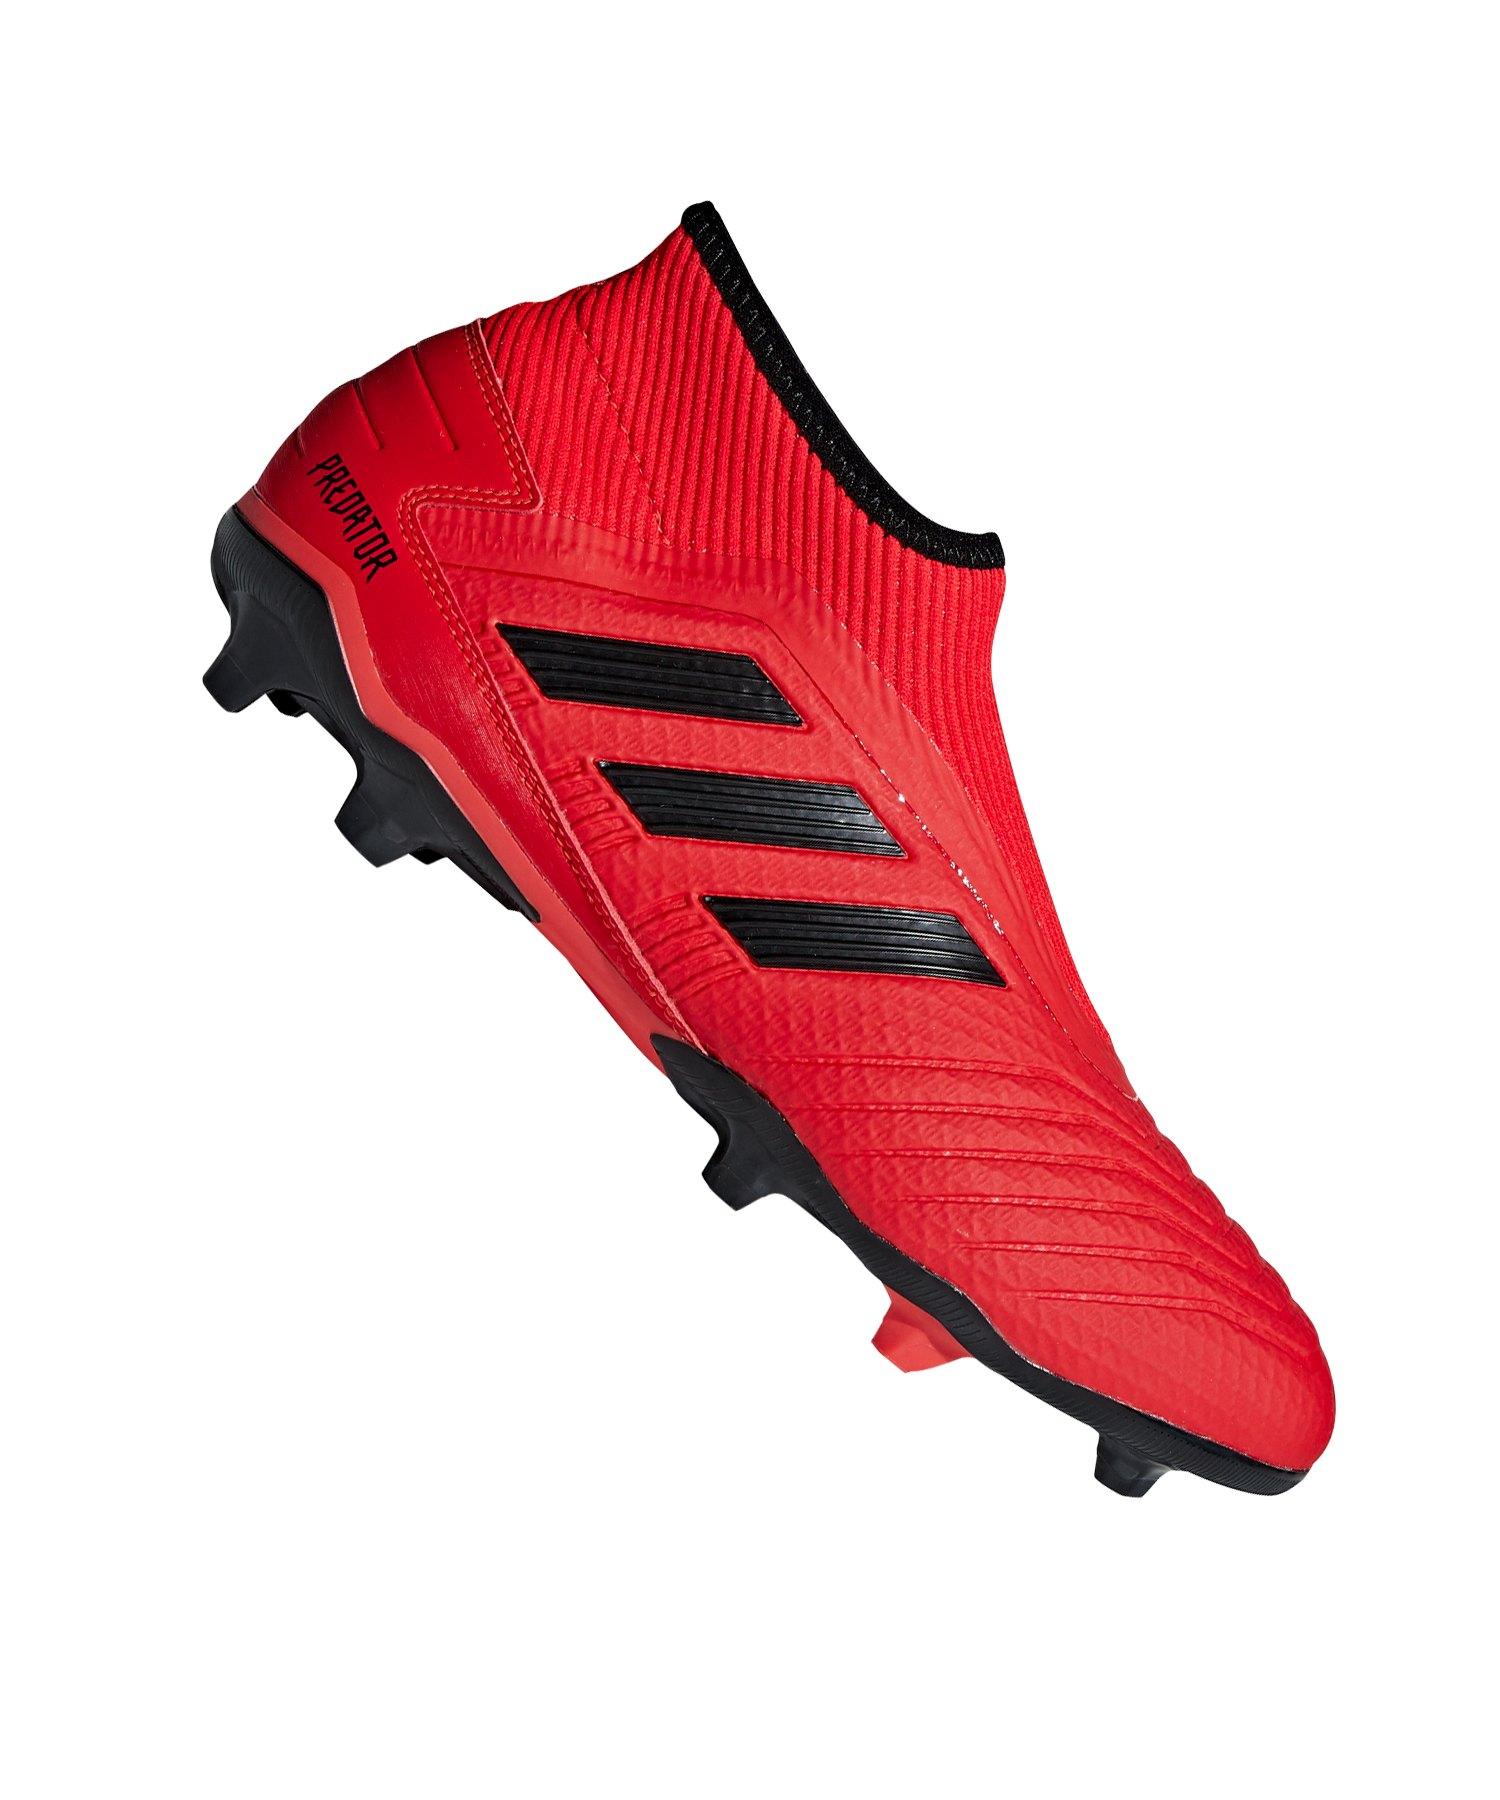 Adidas Socken Fussballschuhe 2019